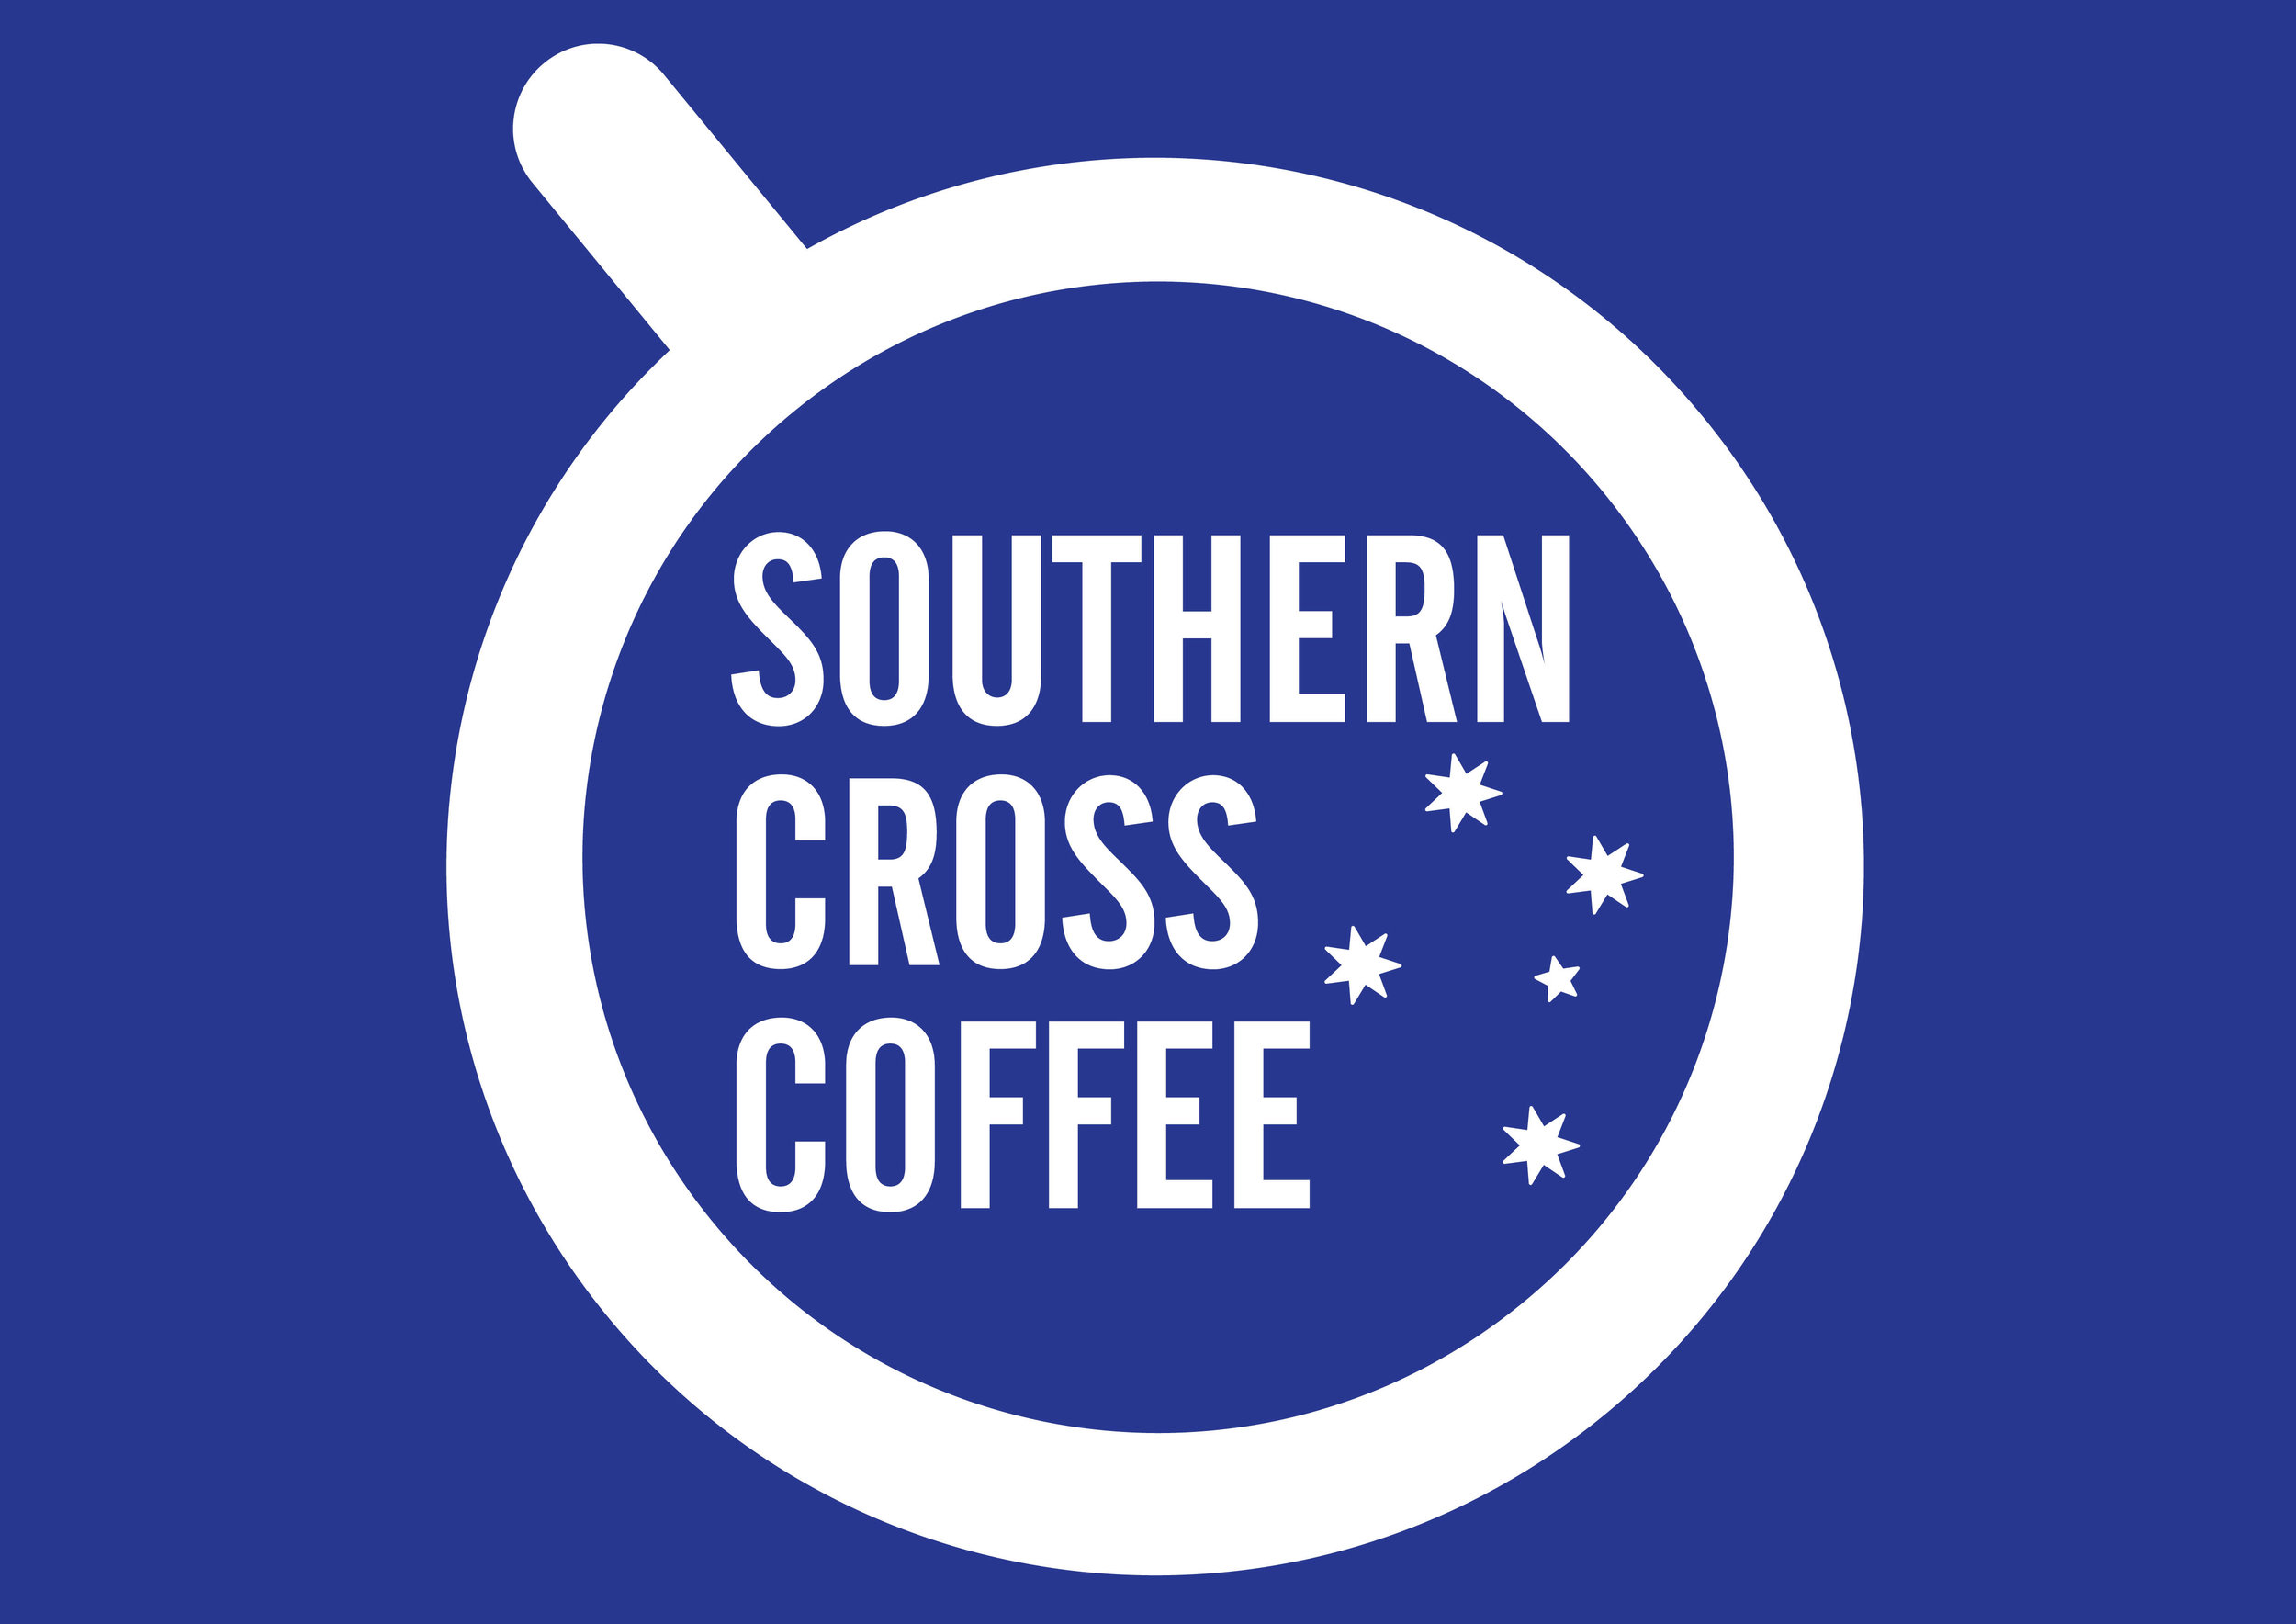 southern-cross-white-blue.jpg